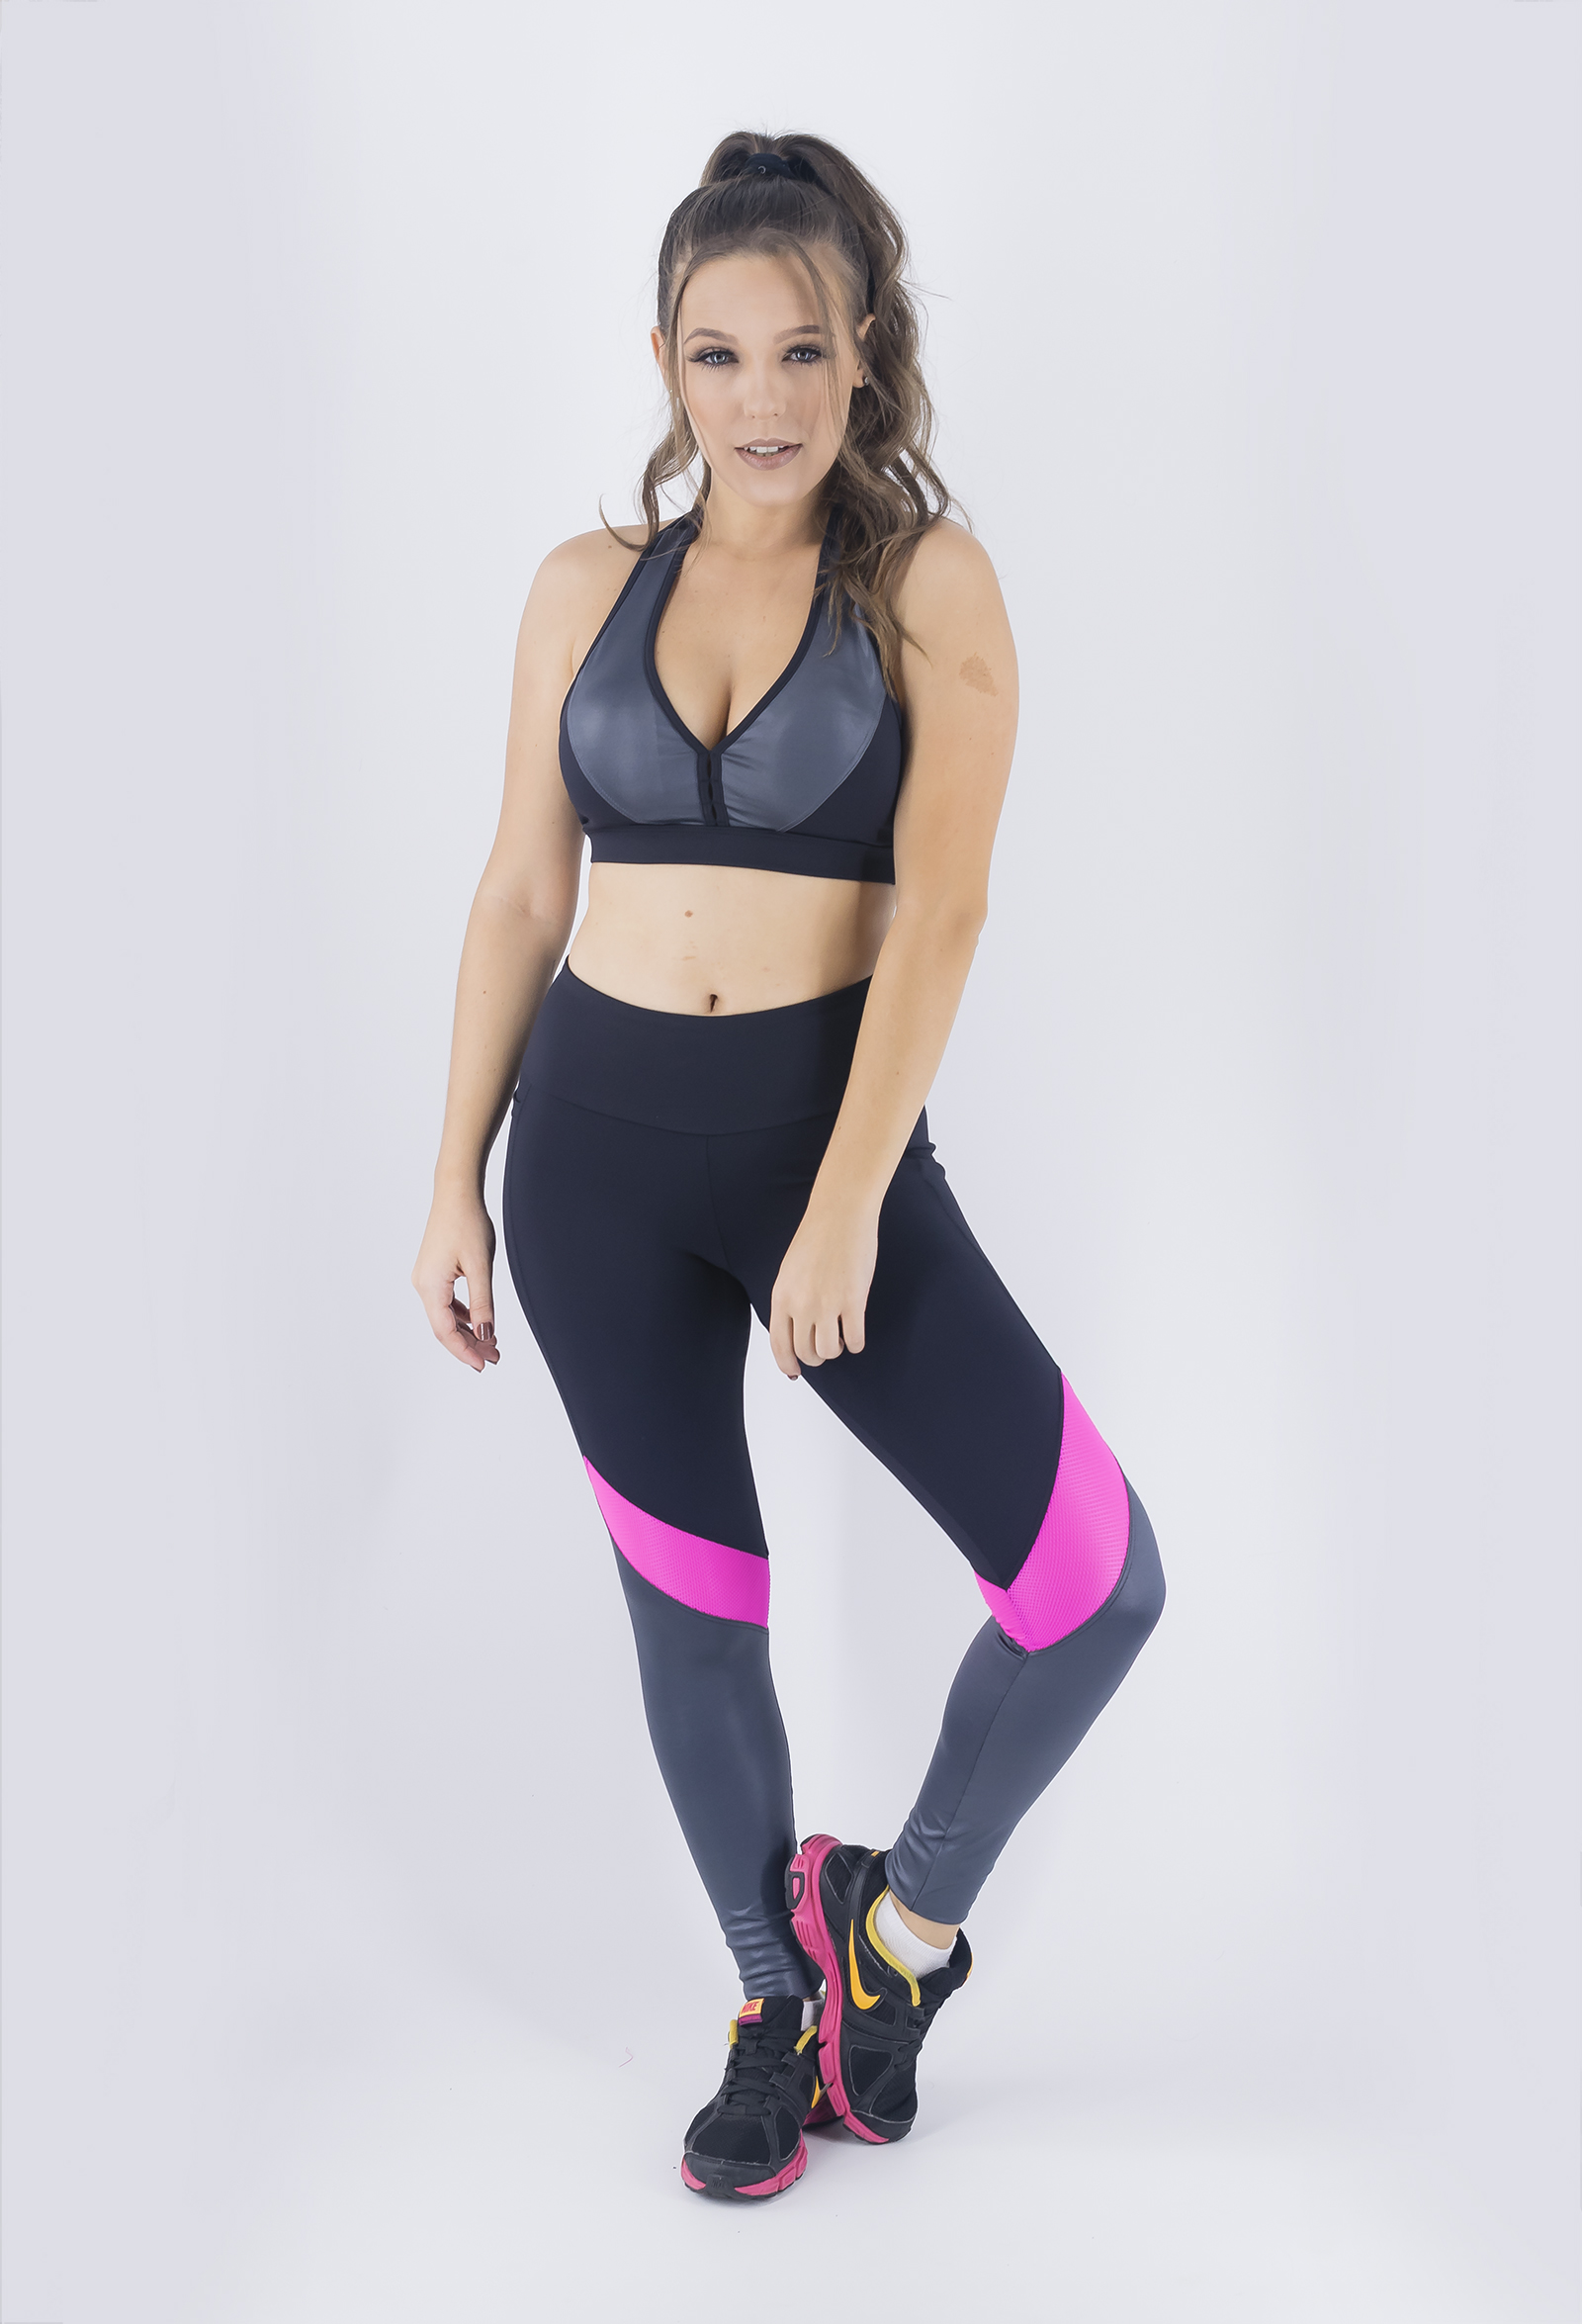 Top Set Chumbo, Coleção Just For You - NKT Fitwear Moda Fitness